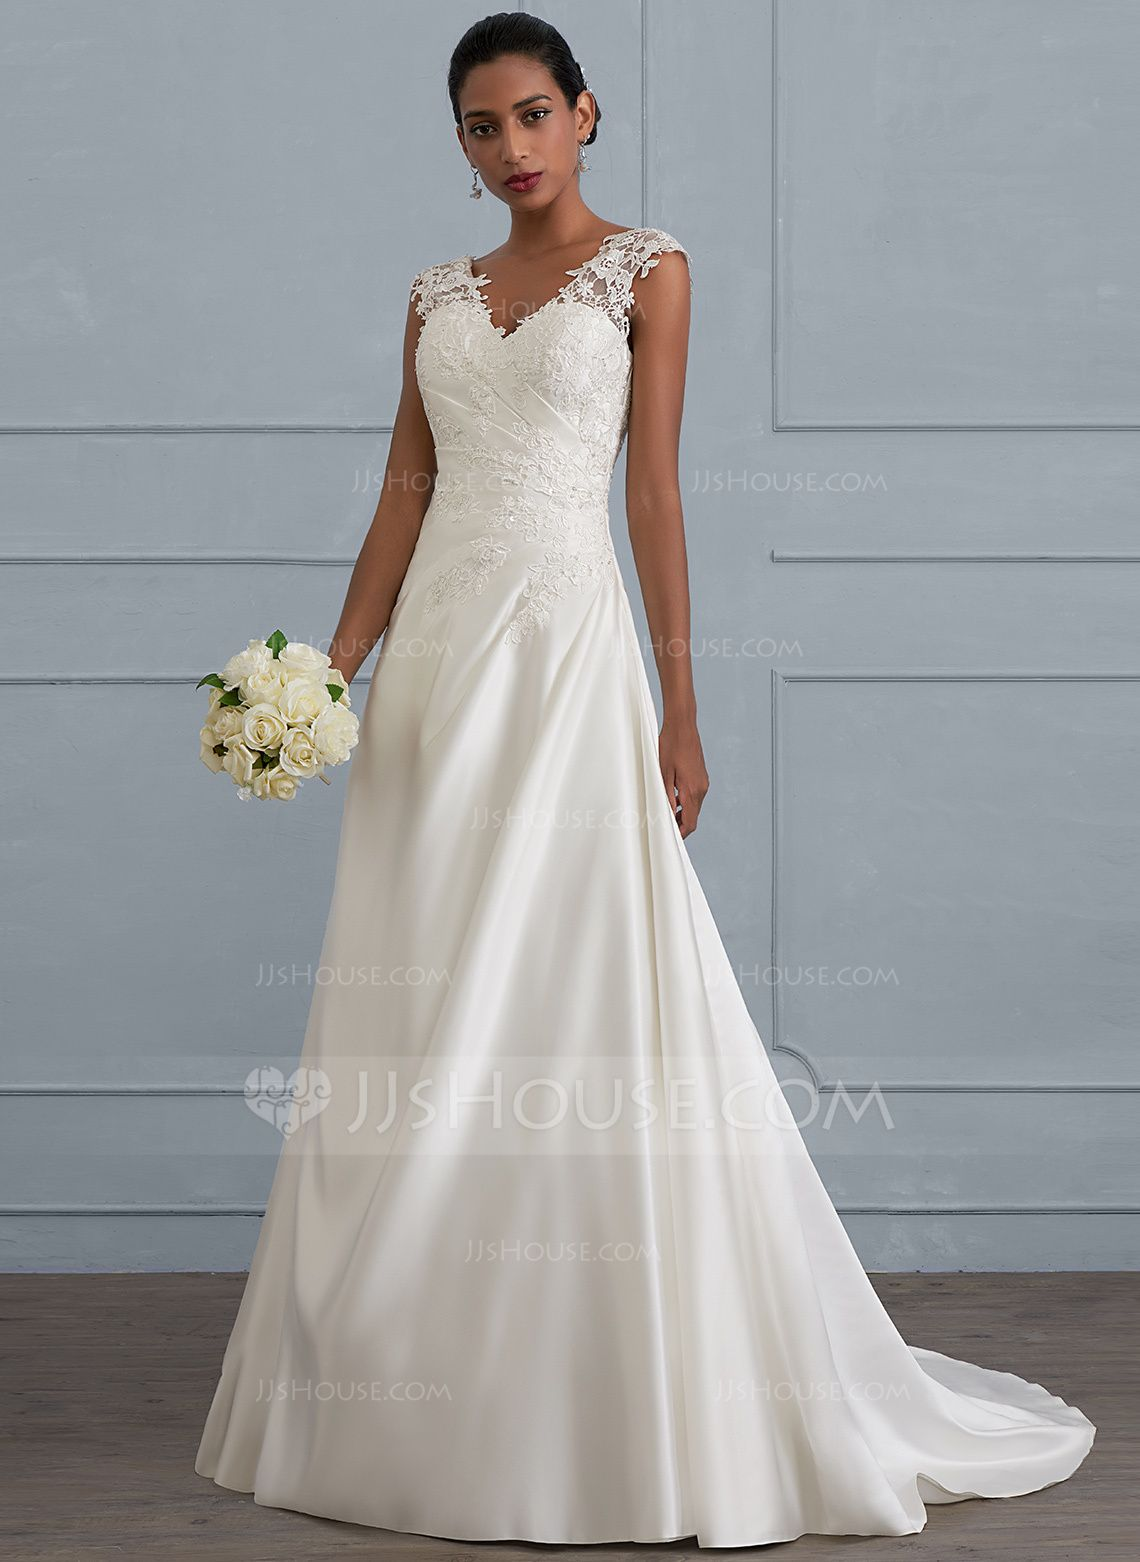 Us 231 00 Ball Gown Princess V Neck Sweep Train Satin Wedding Dress With Ruffle Beading Sequins Jj S House Best Wedding Dresses Bridal Dresses Ruffle Wedding Dress